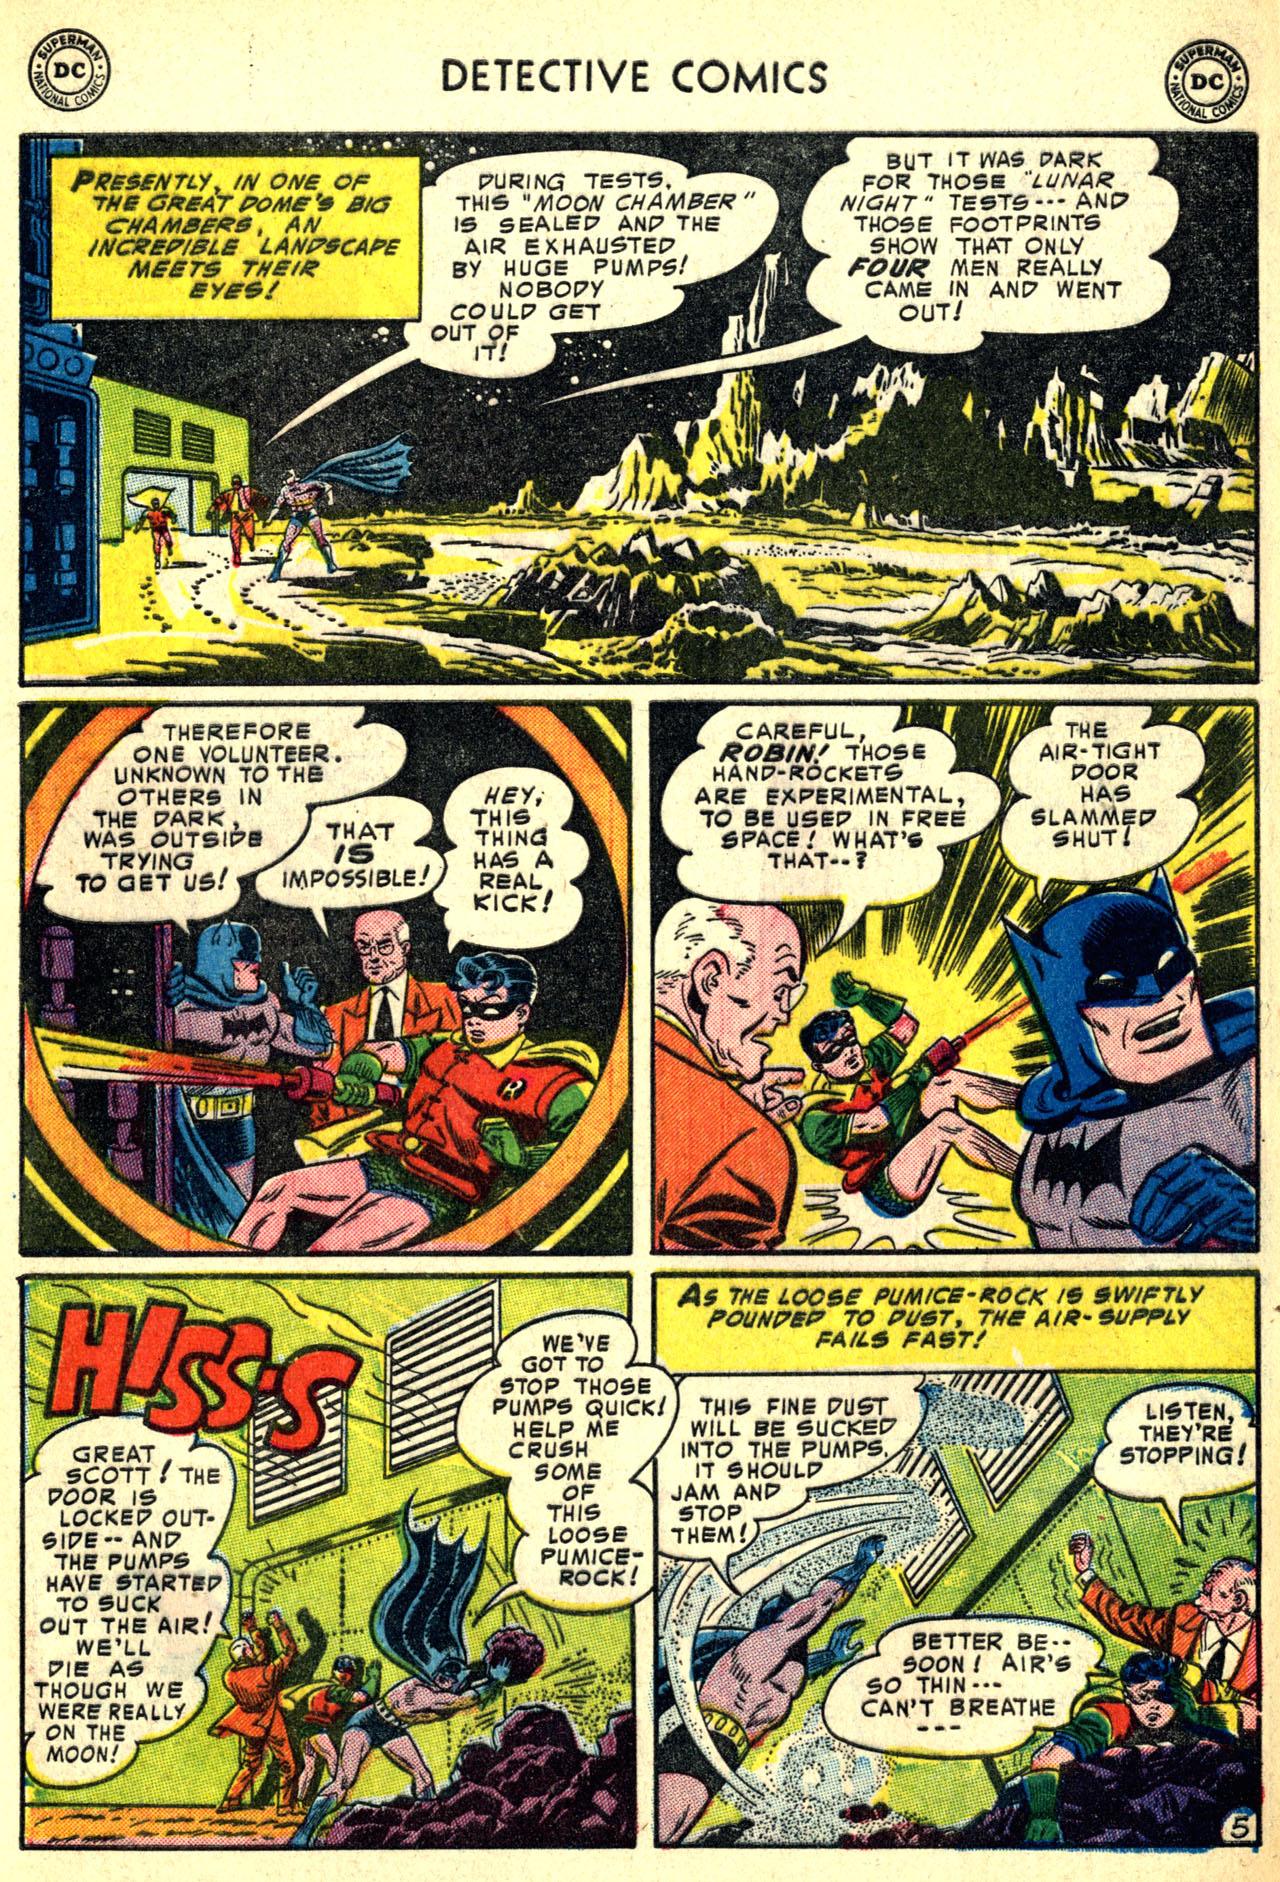 Detective Comics (1937) 208 Page 6